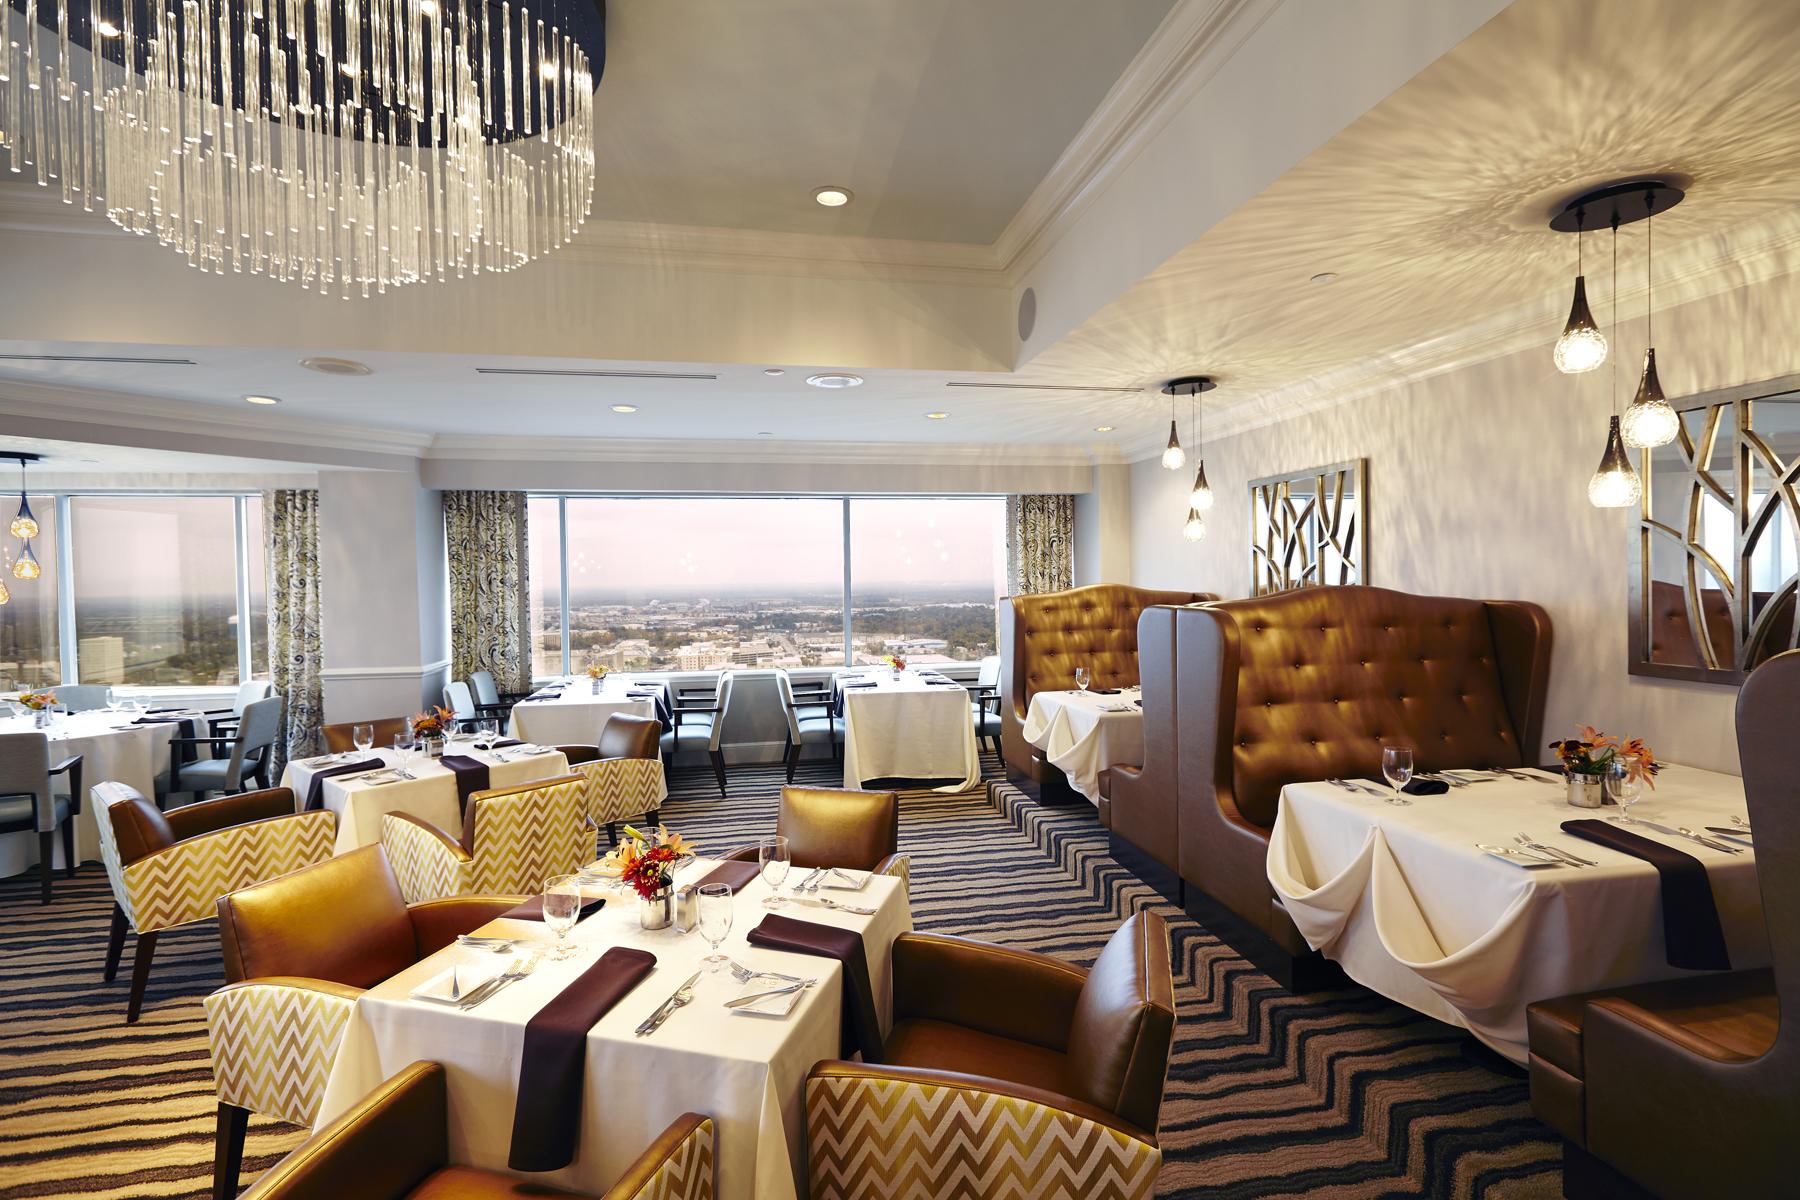 Gallery Dining Cap City Club.jpg